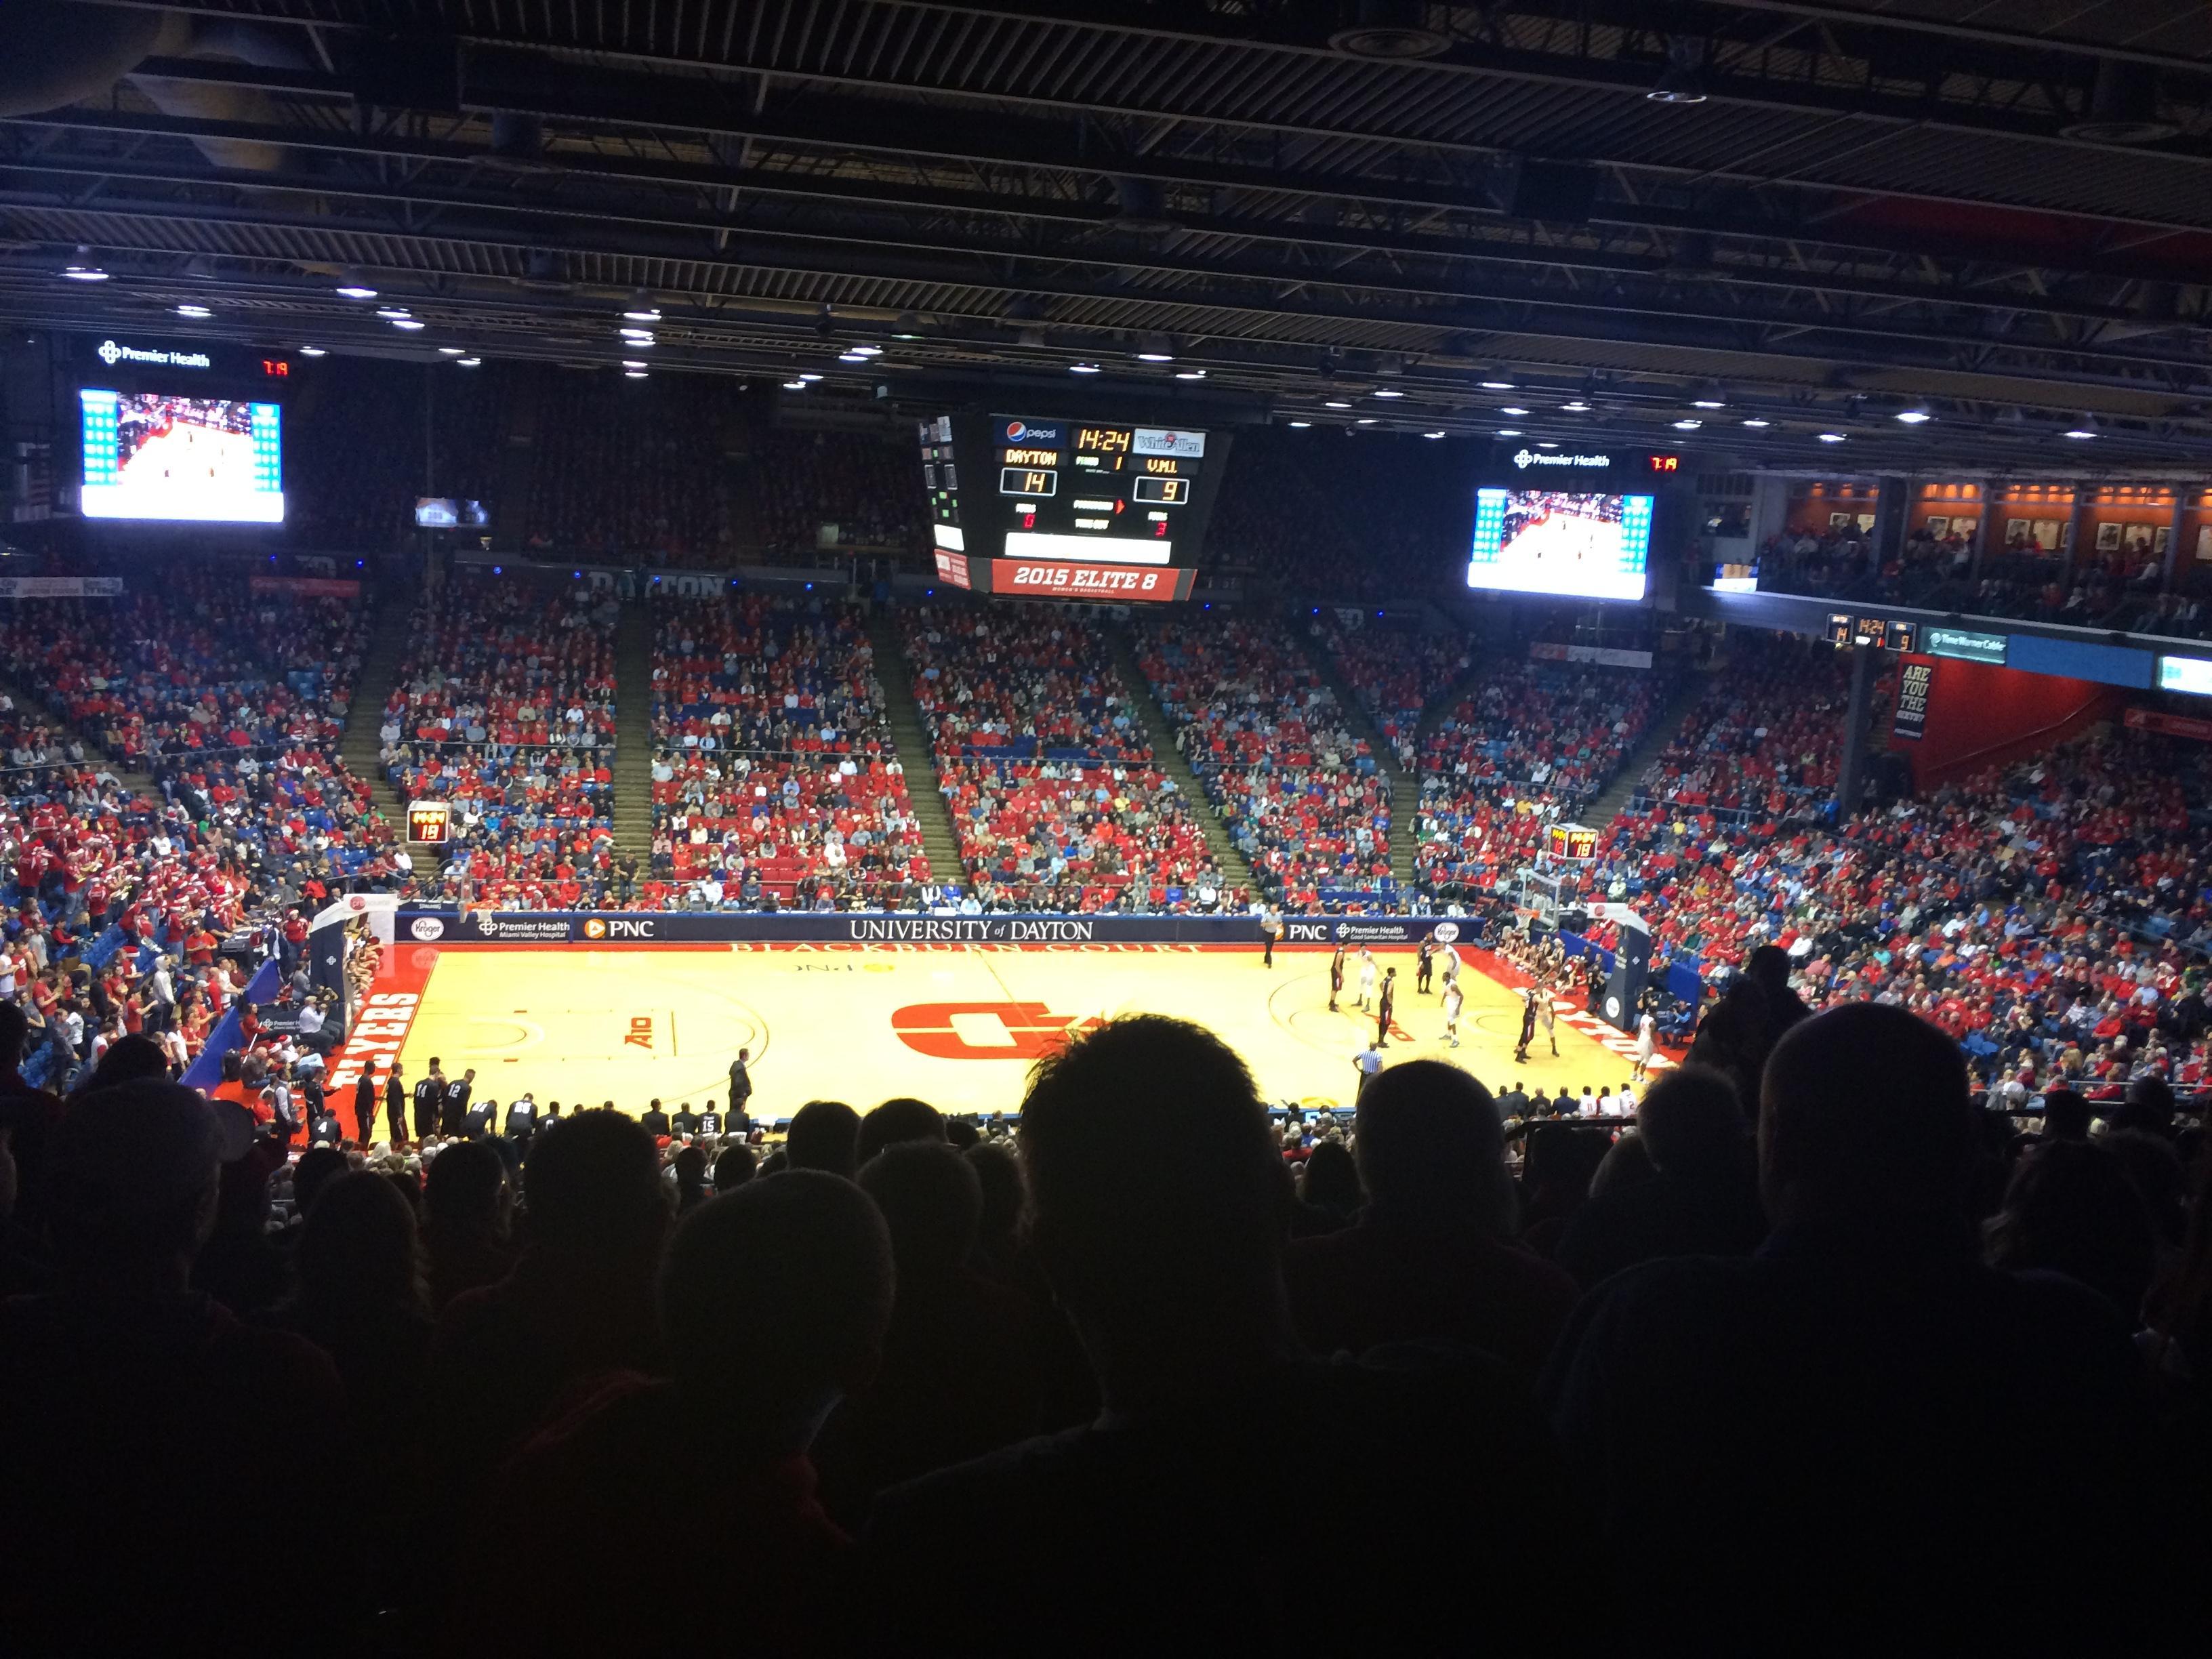 University of Dayton Arena Vak 310 Rij K Stoel 9